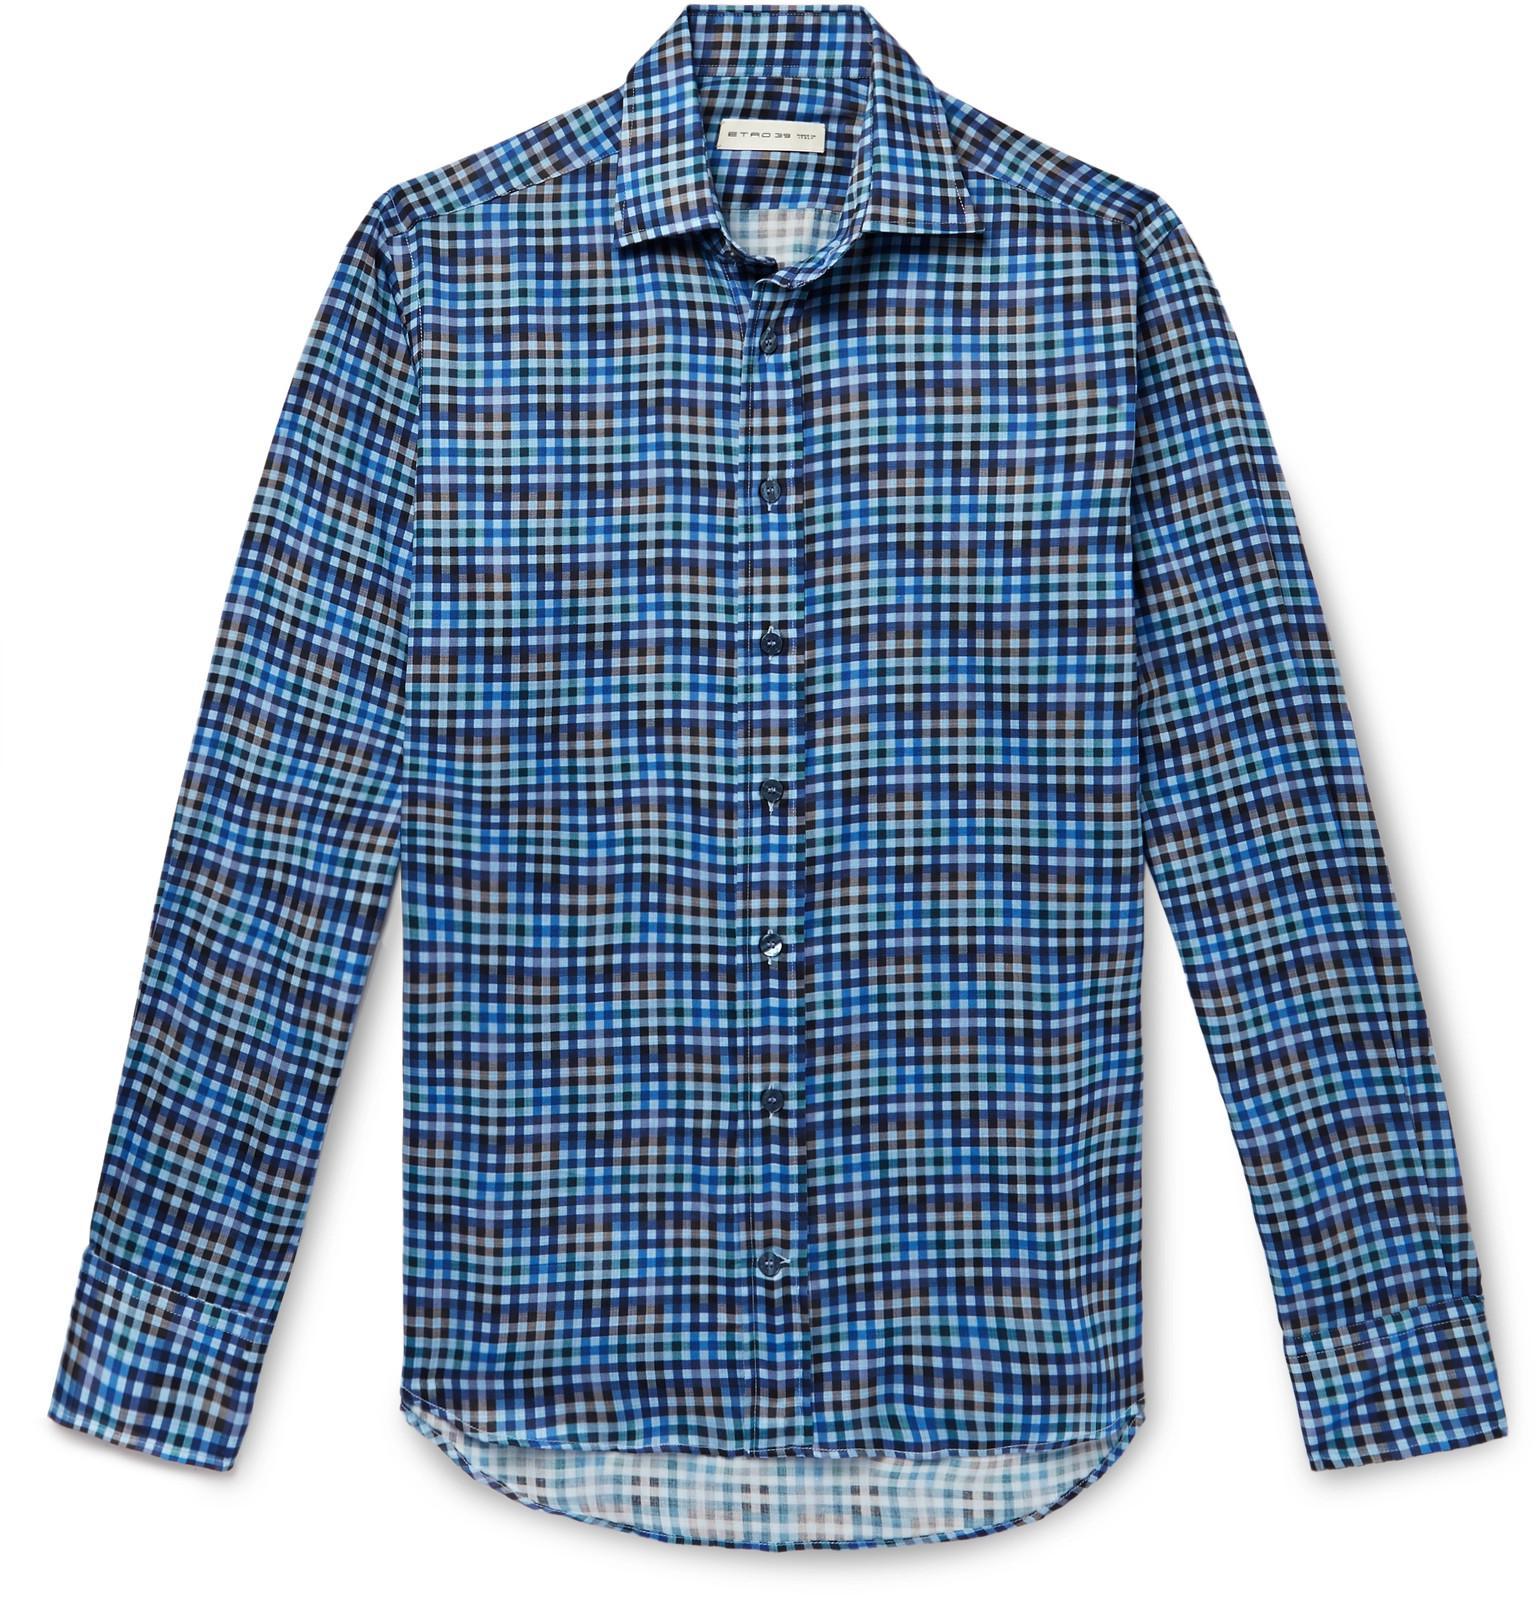 a838e5508a etro-blue-Slim-fit-Checked-Cotton-Shirt.jpeg